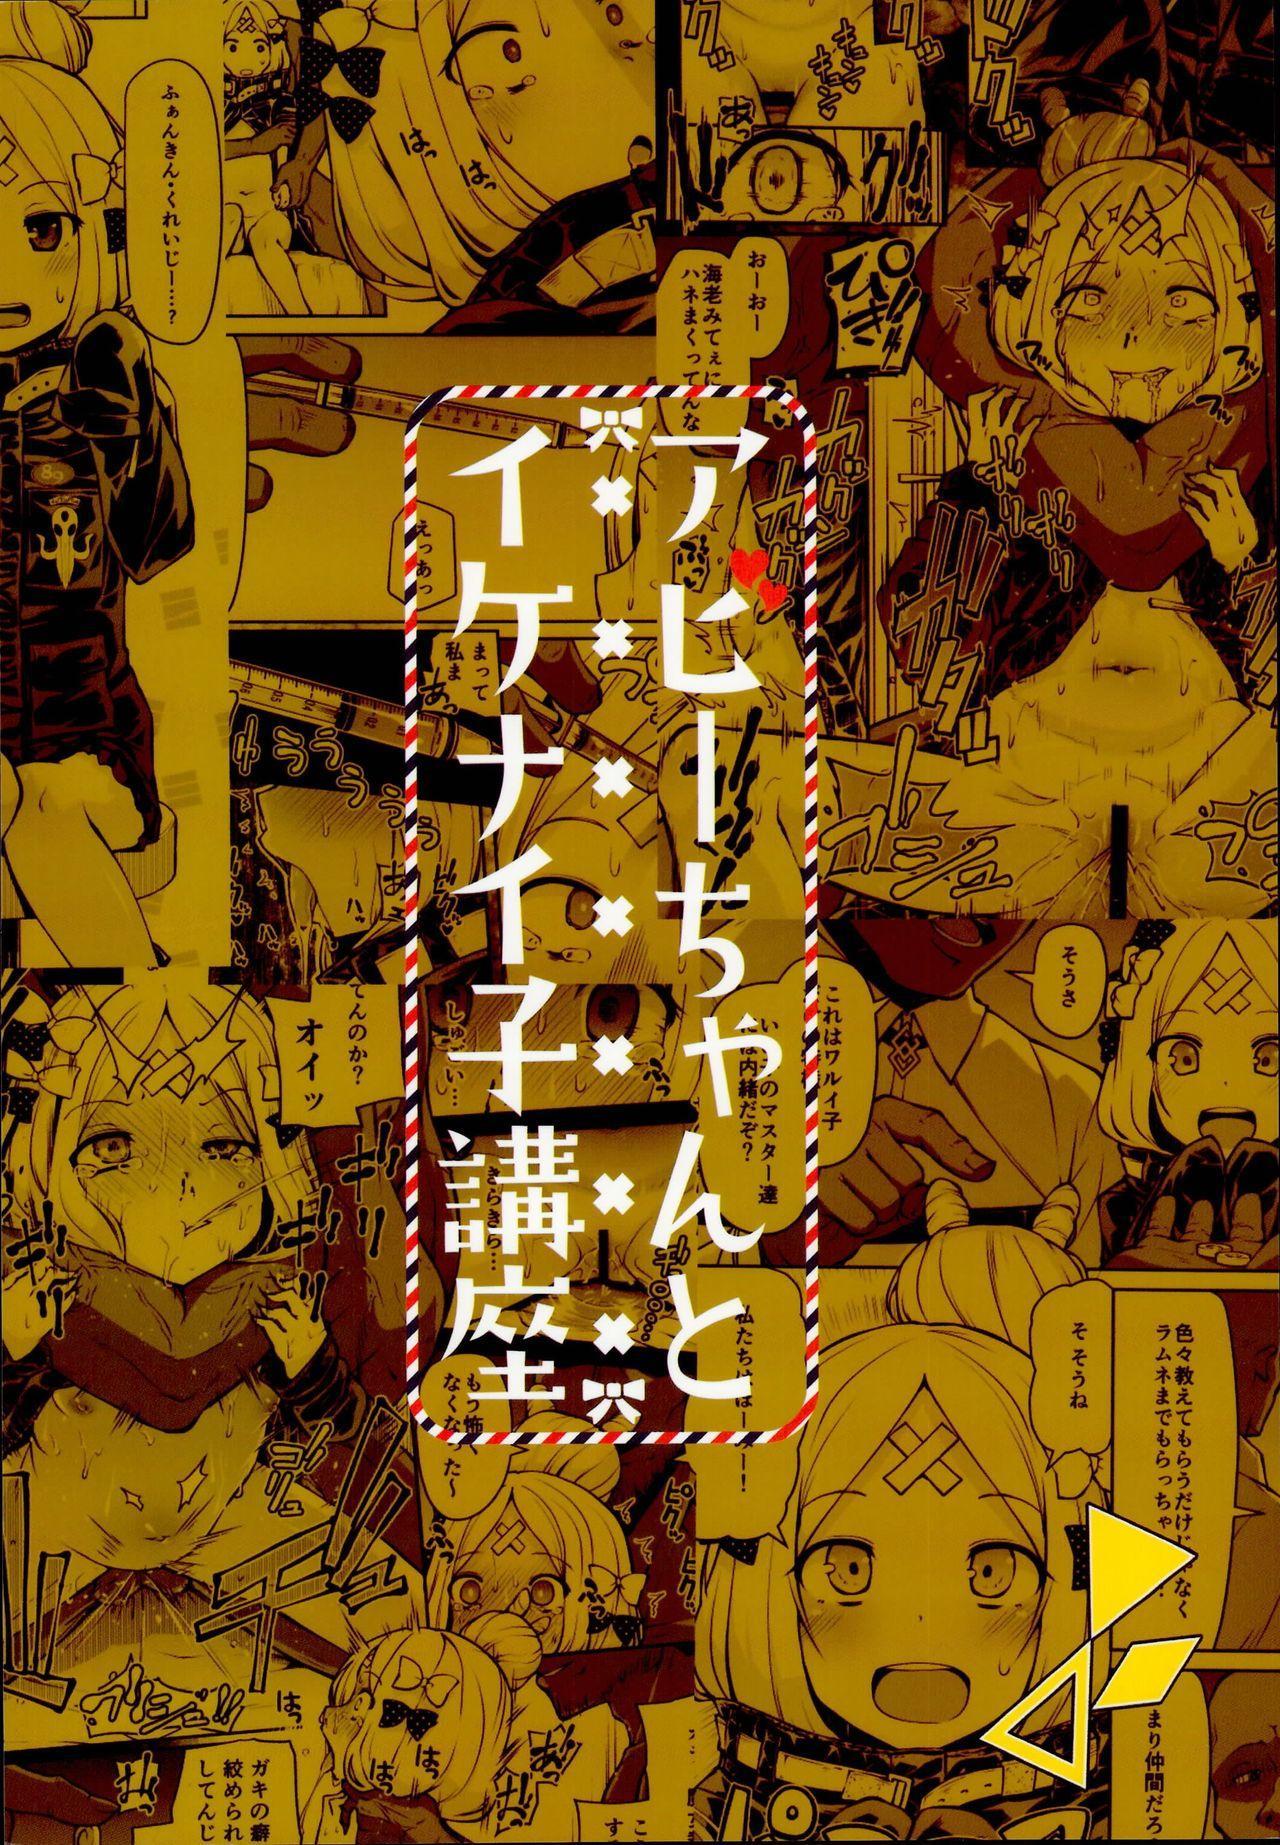 Abby-chan to Ikenai Ko Kouza 21